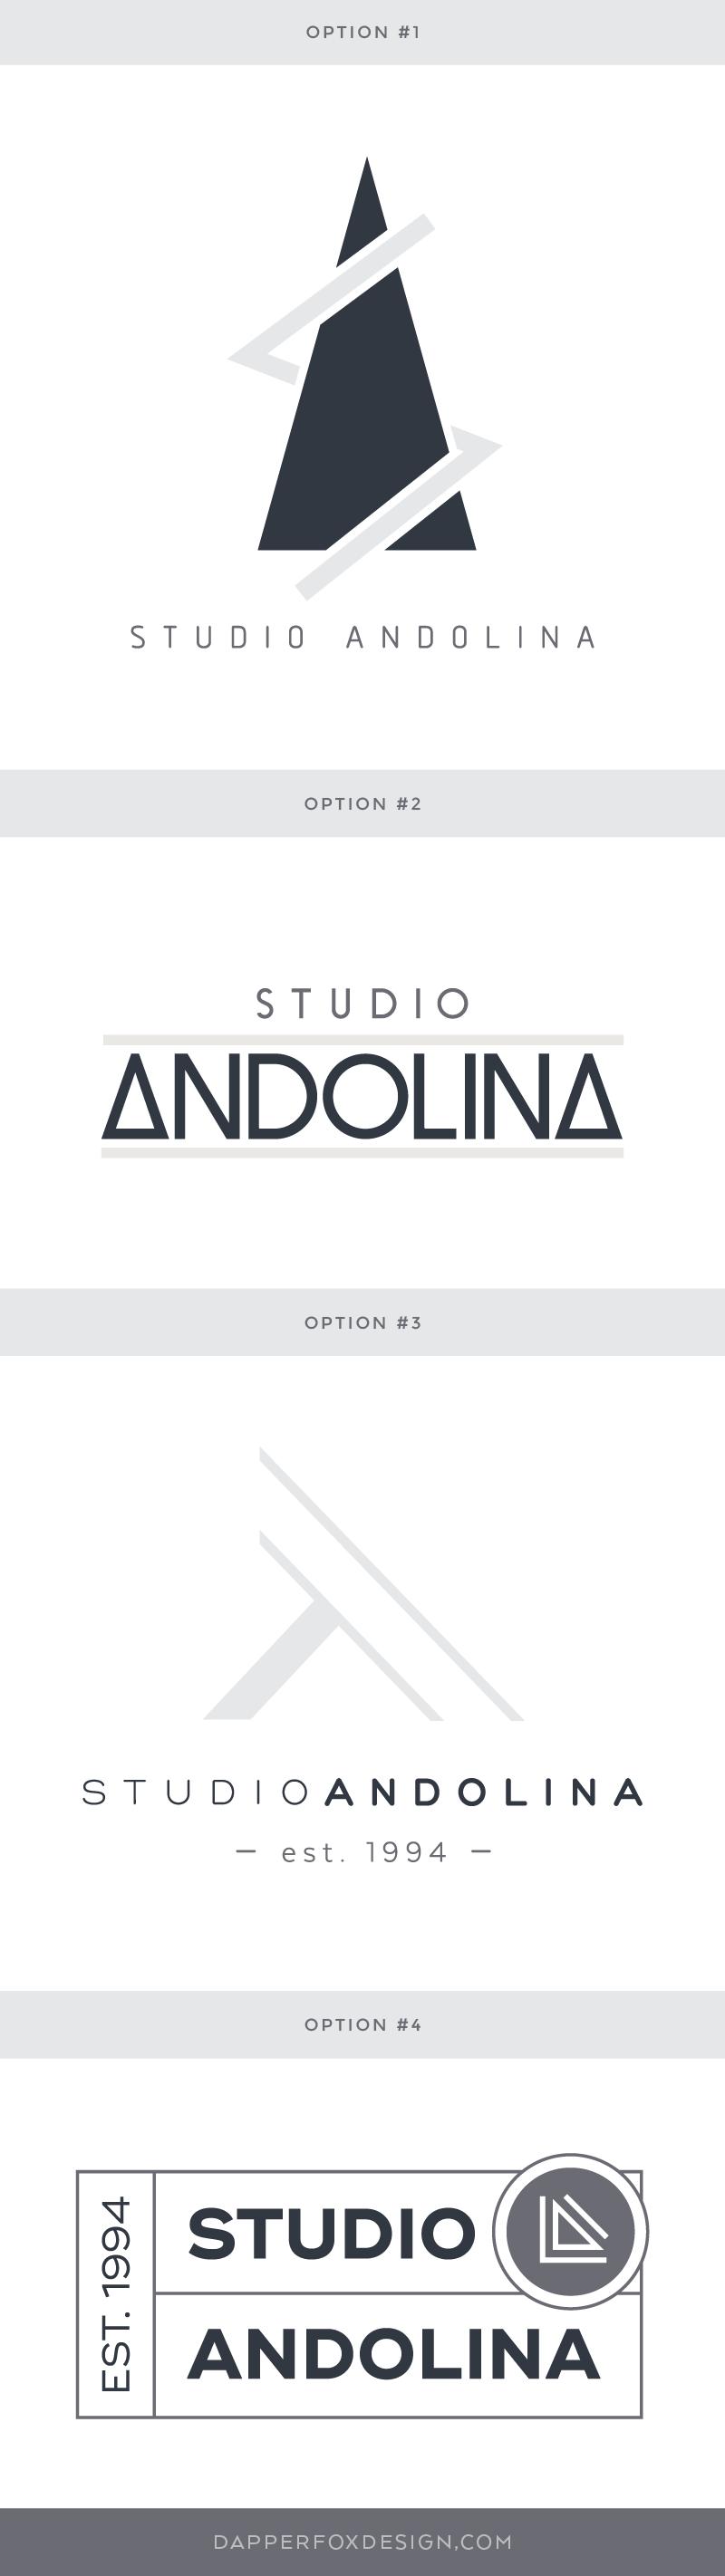 Logo Design options for StudioAndolina by Dapper Fox - Modern Logo Design, #masculine #neutral #branding #logo #logodesign #modernlogo